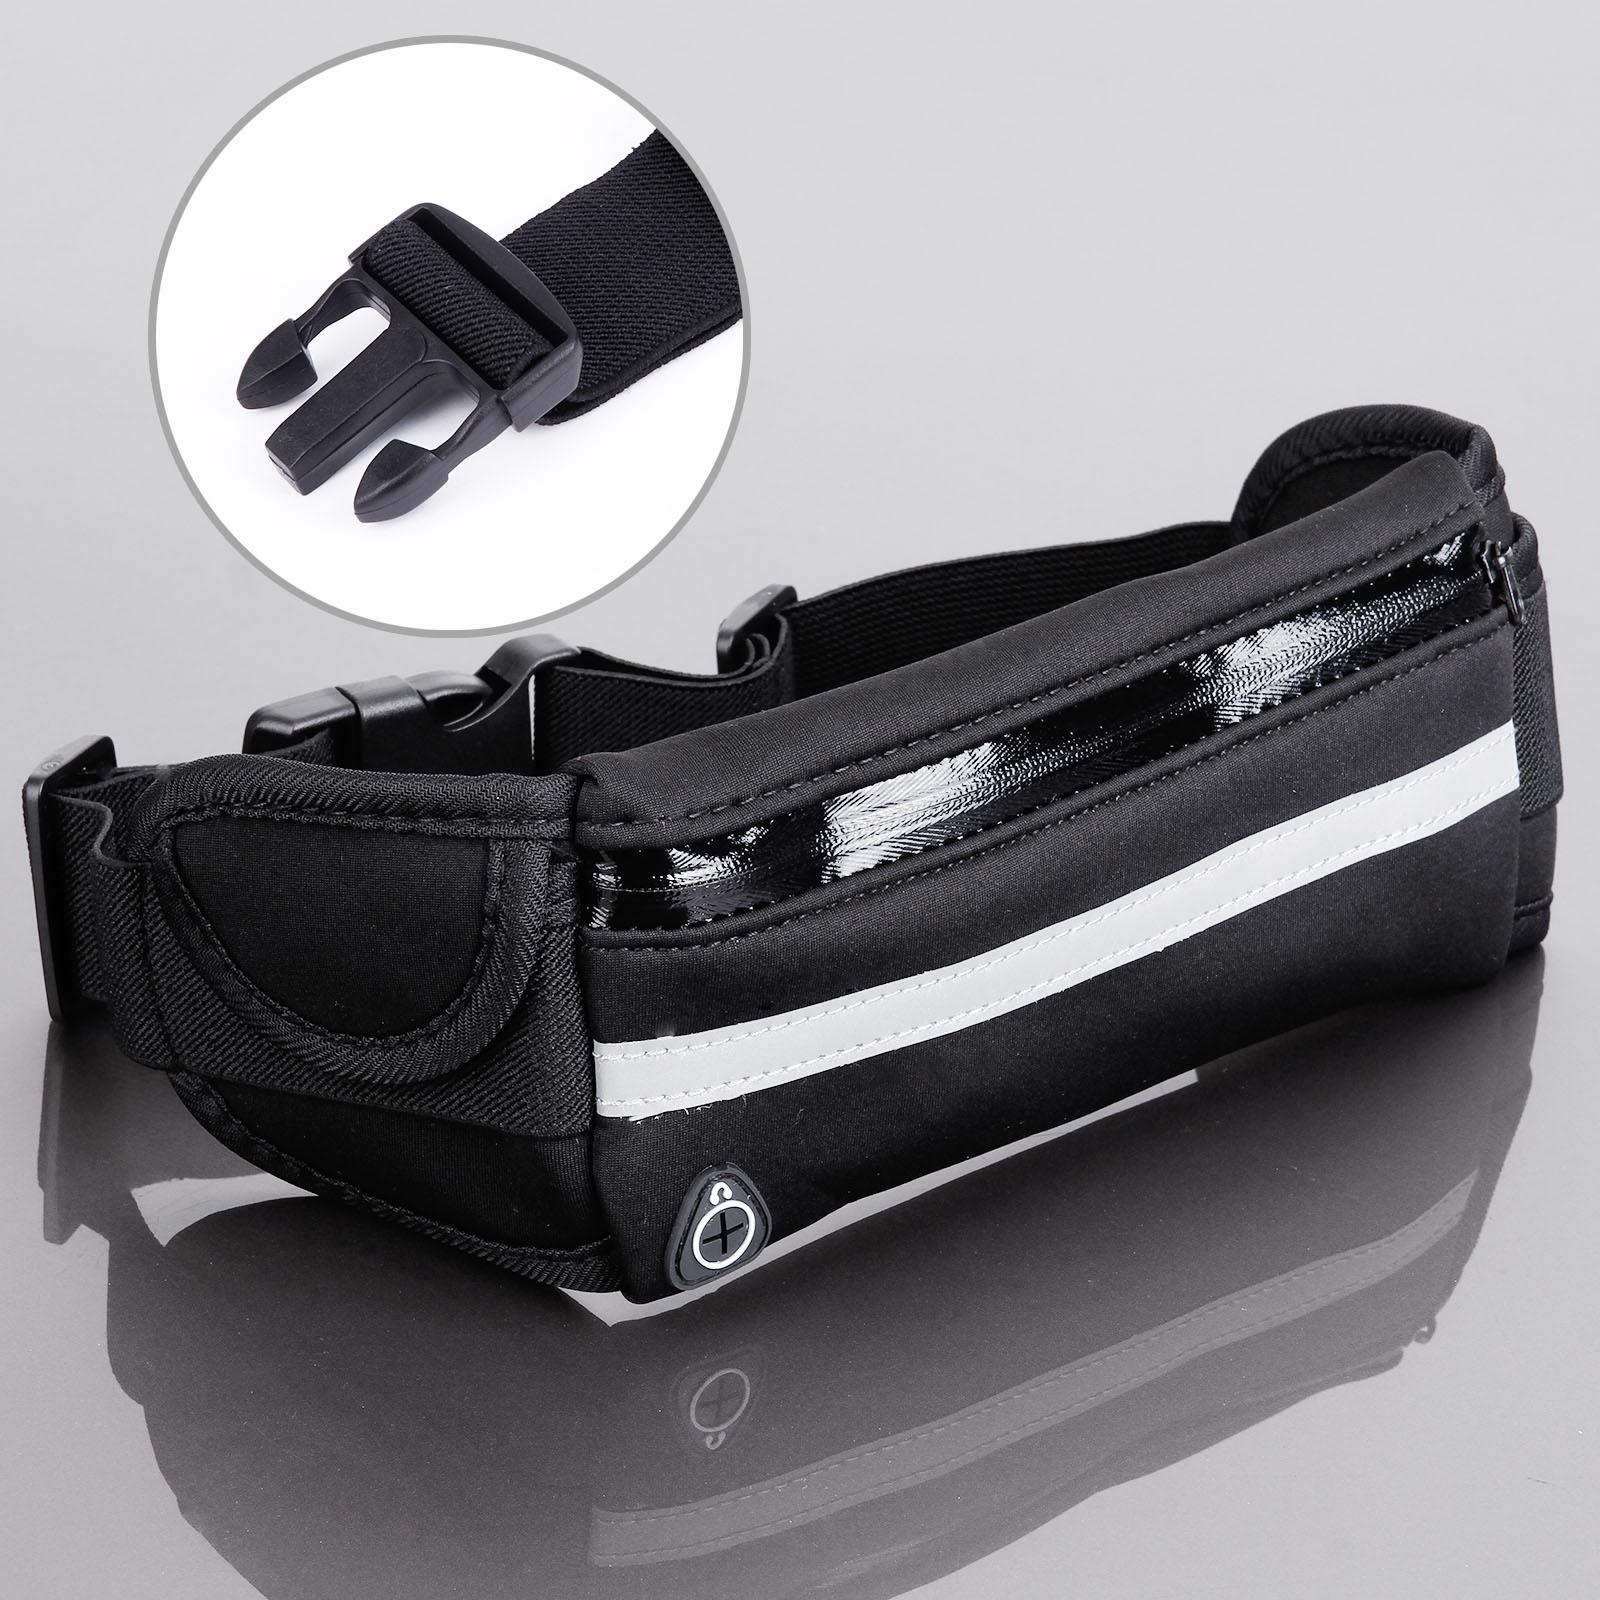 noir sac banane ceinture de voyage portefeuille jogging course sport ebay. Black Bedroom Furniture Sets. Home Design Ideas